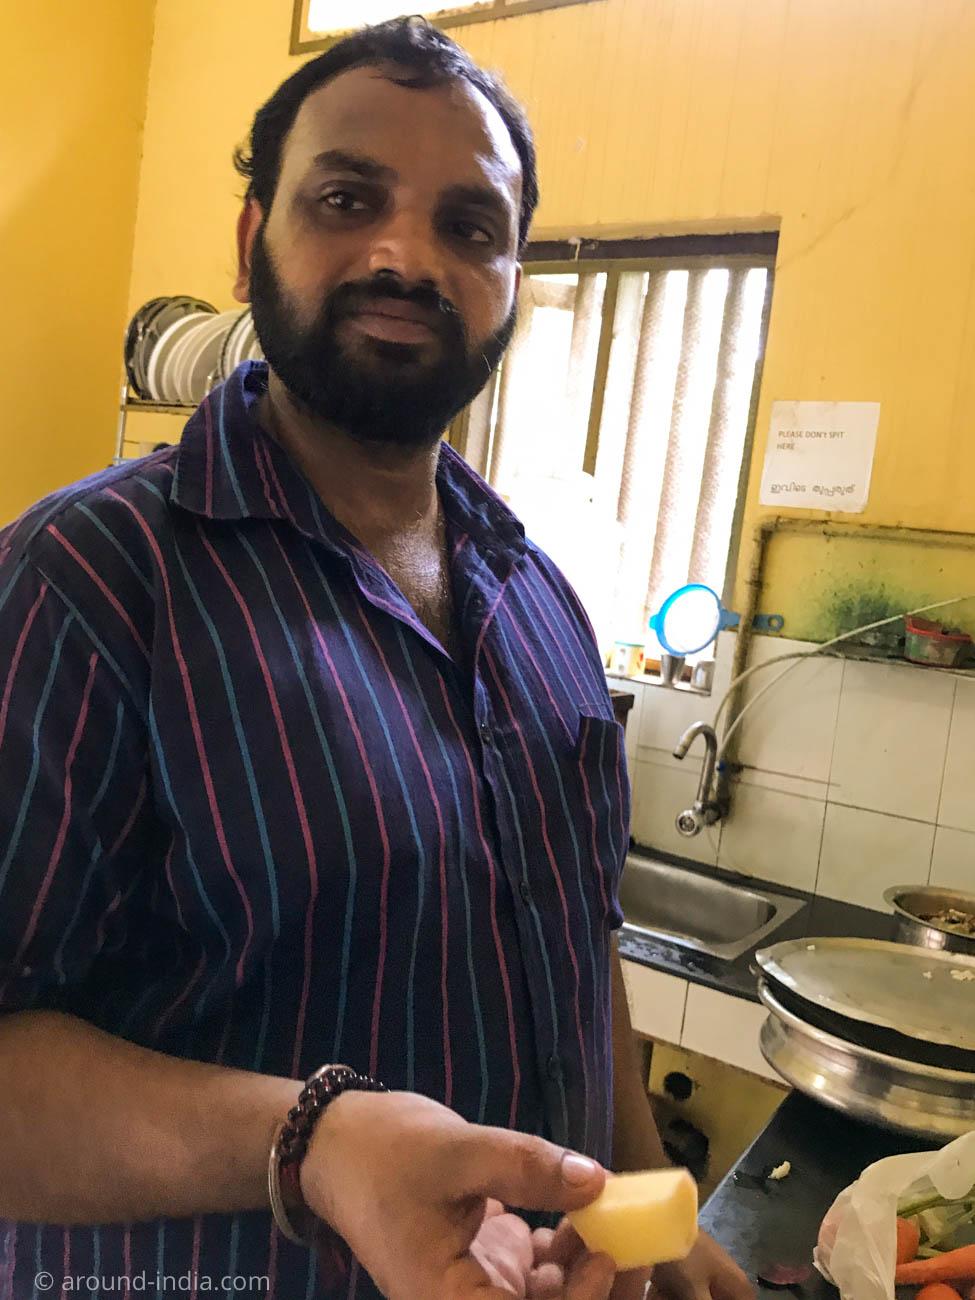 PVAアーユルヴェーダ病院のキッチンで、ランチ用サンバルのバナナを見せてくれるシェフのラジェシ